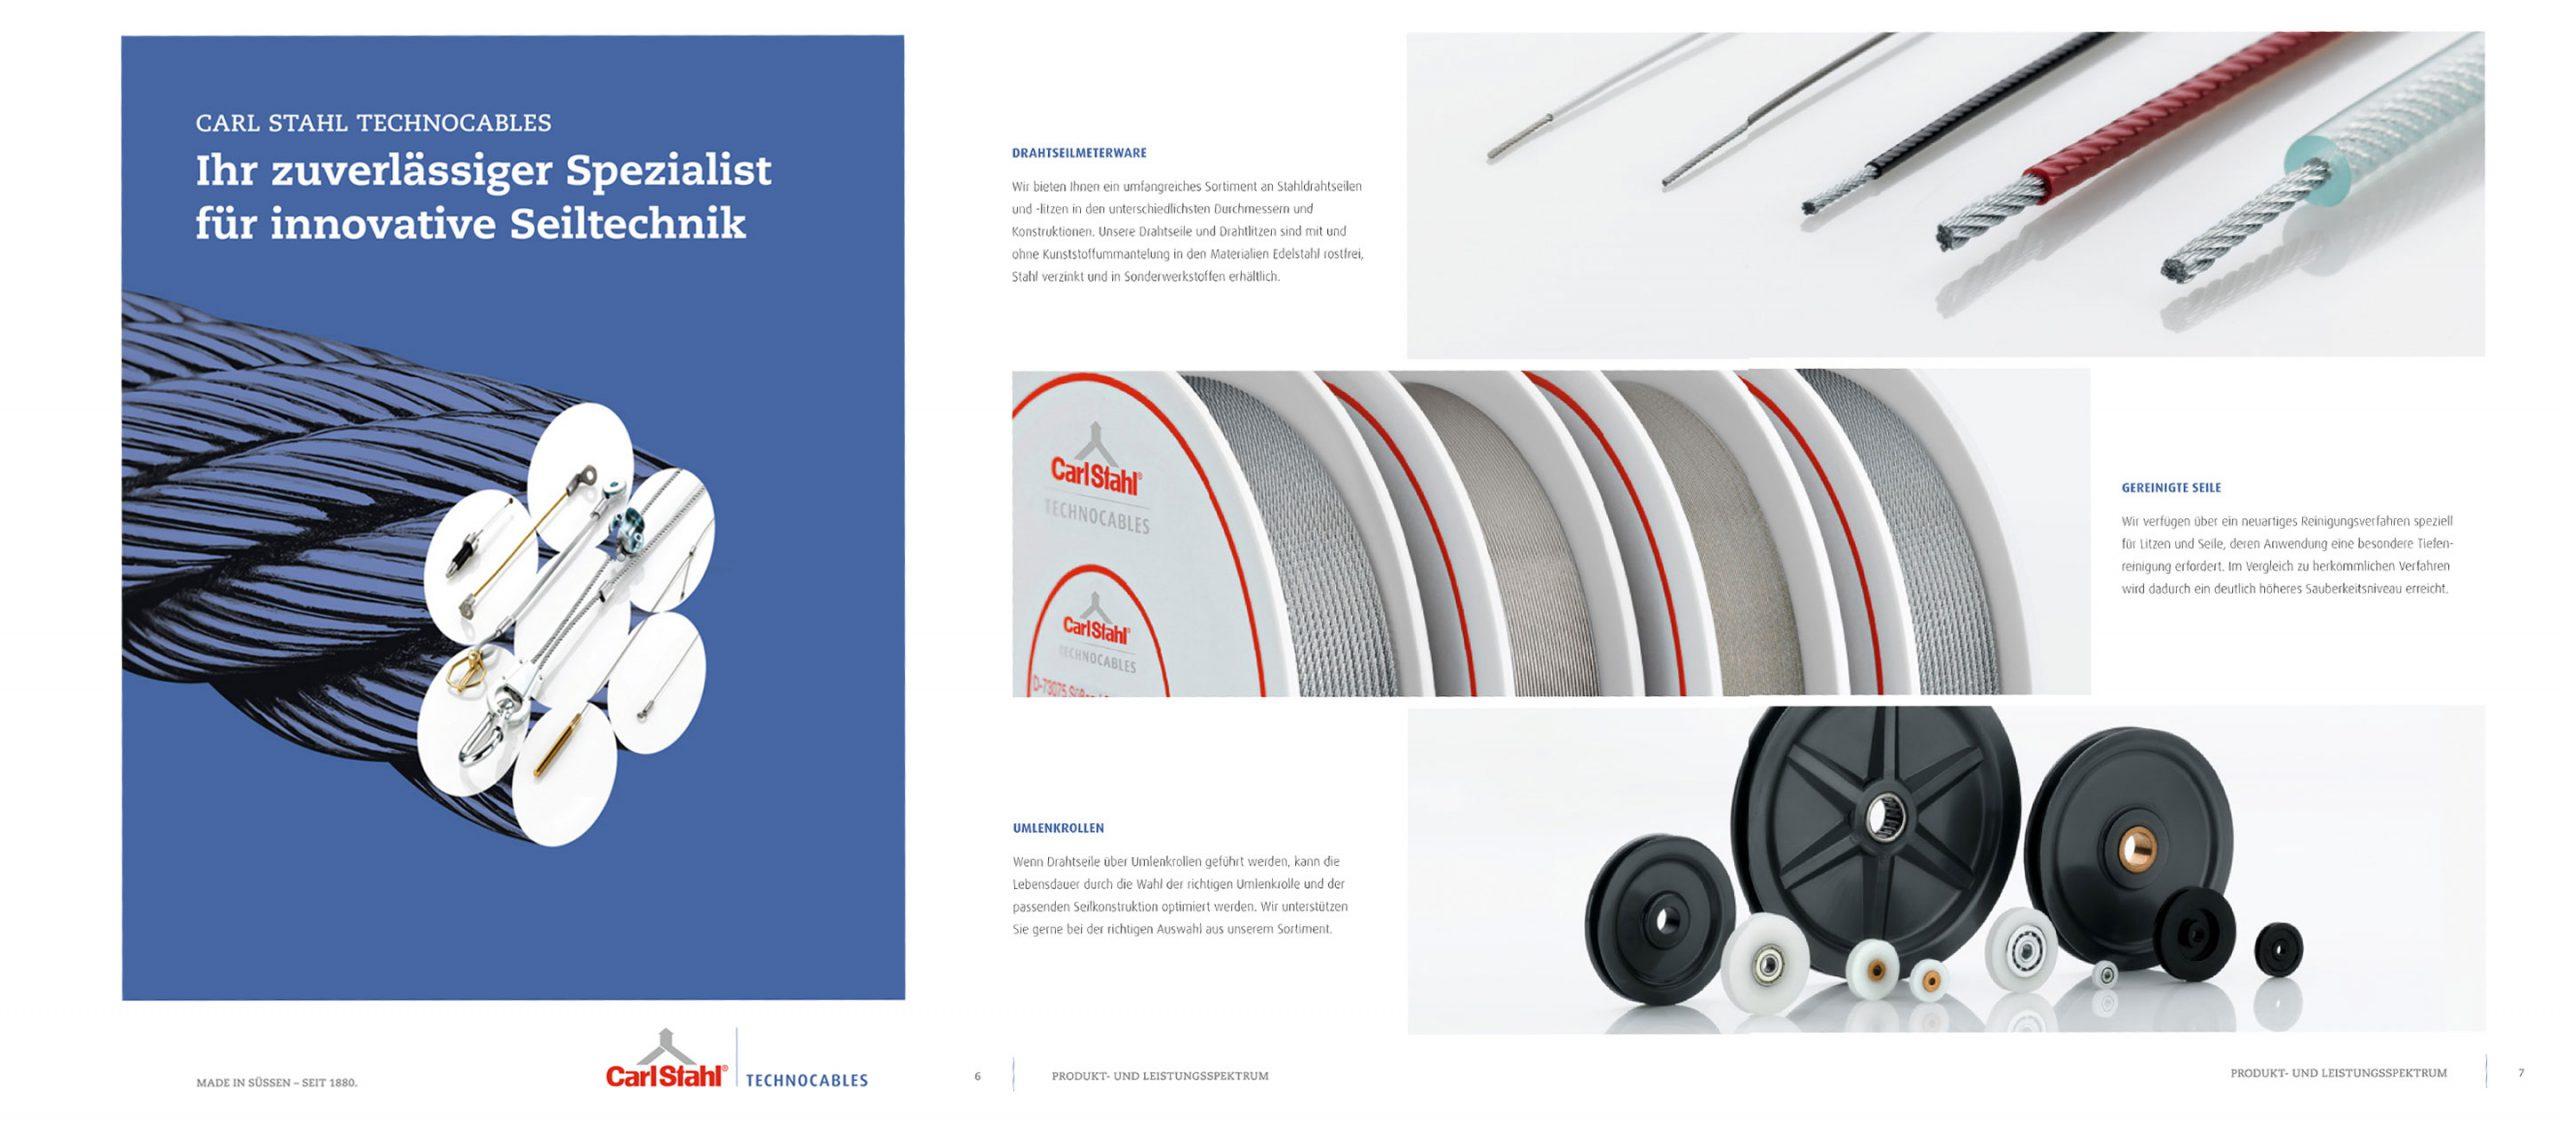 Carl-Stahl-Technocables_Beispiel_Referenz-NEU_web